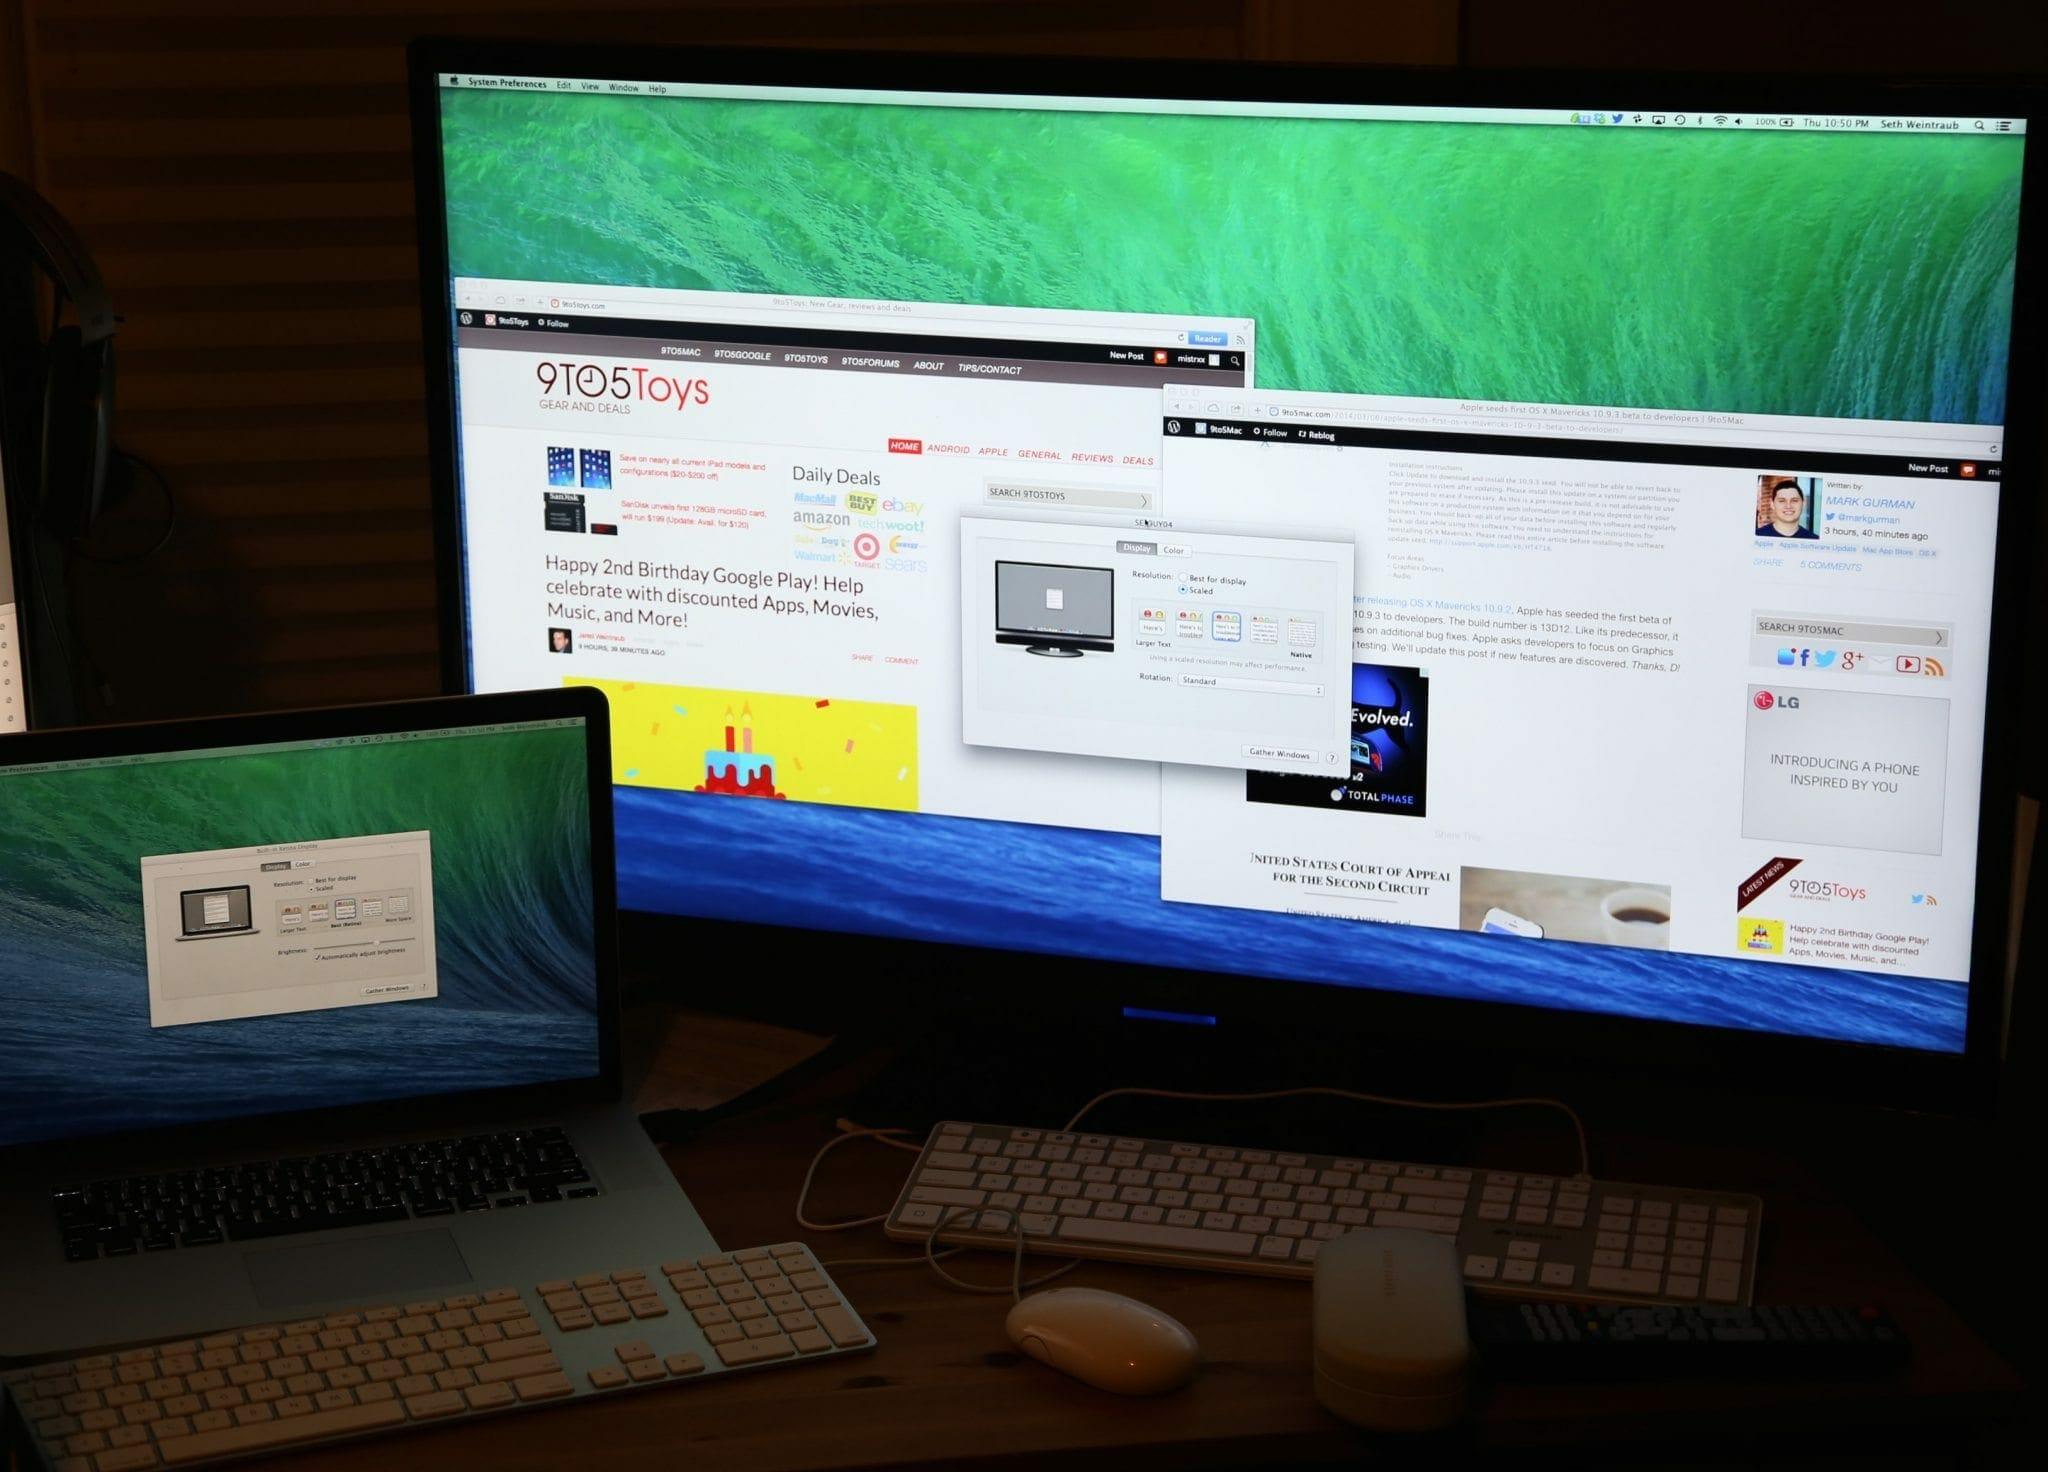 Download MacOS X   Mavericks VMWare Image for instant ...